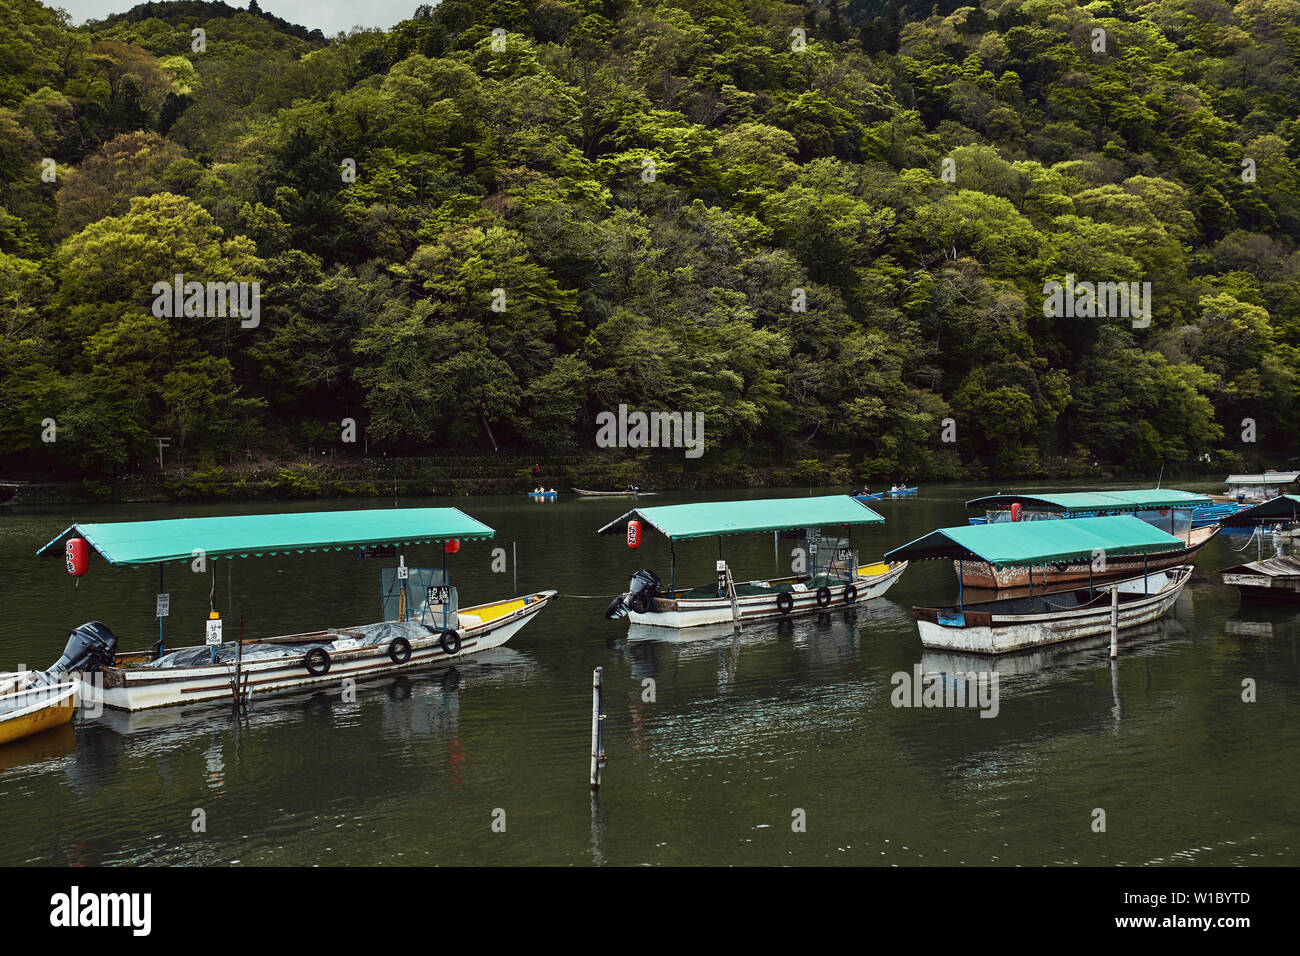 Boats lined up along the Hozu River in Arashiyama, Japan - Stock Image